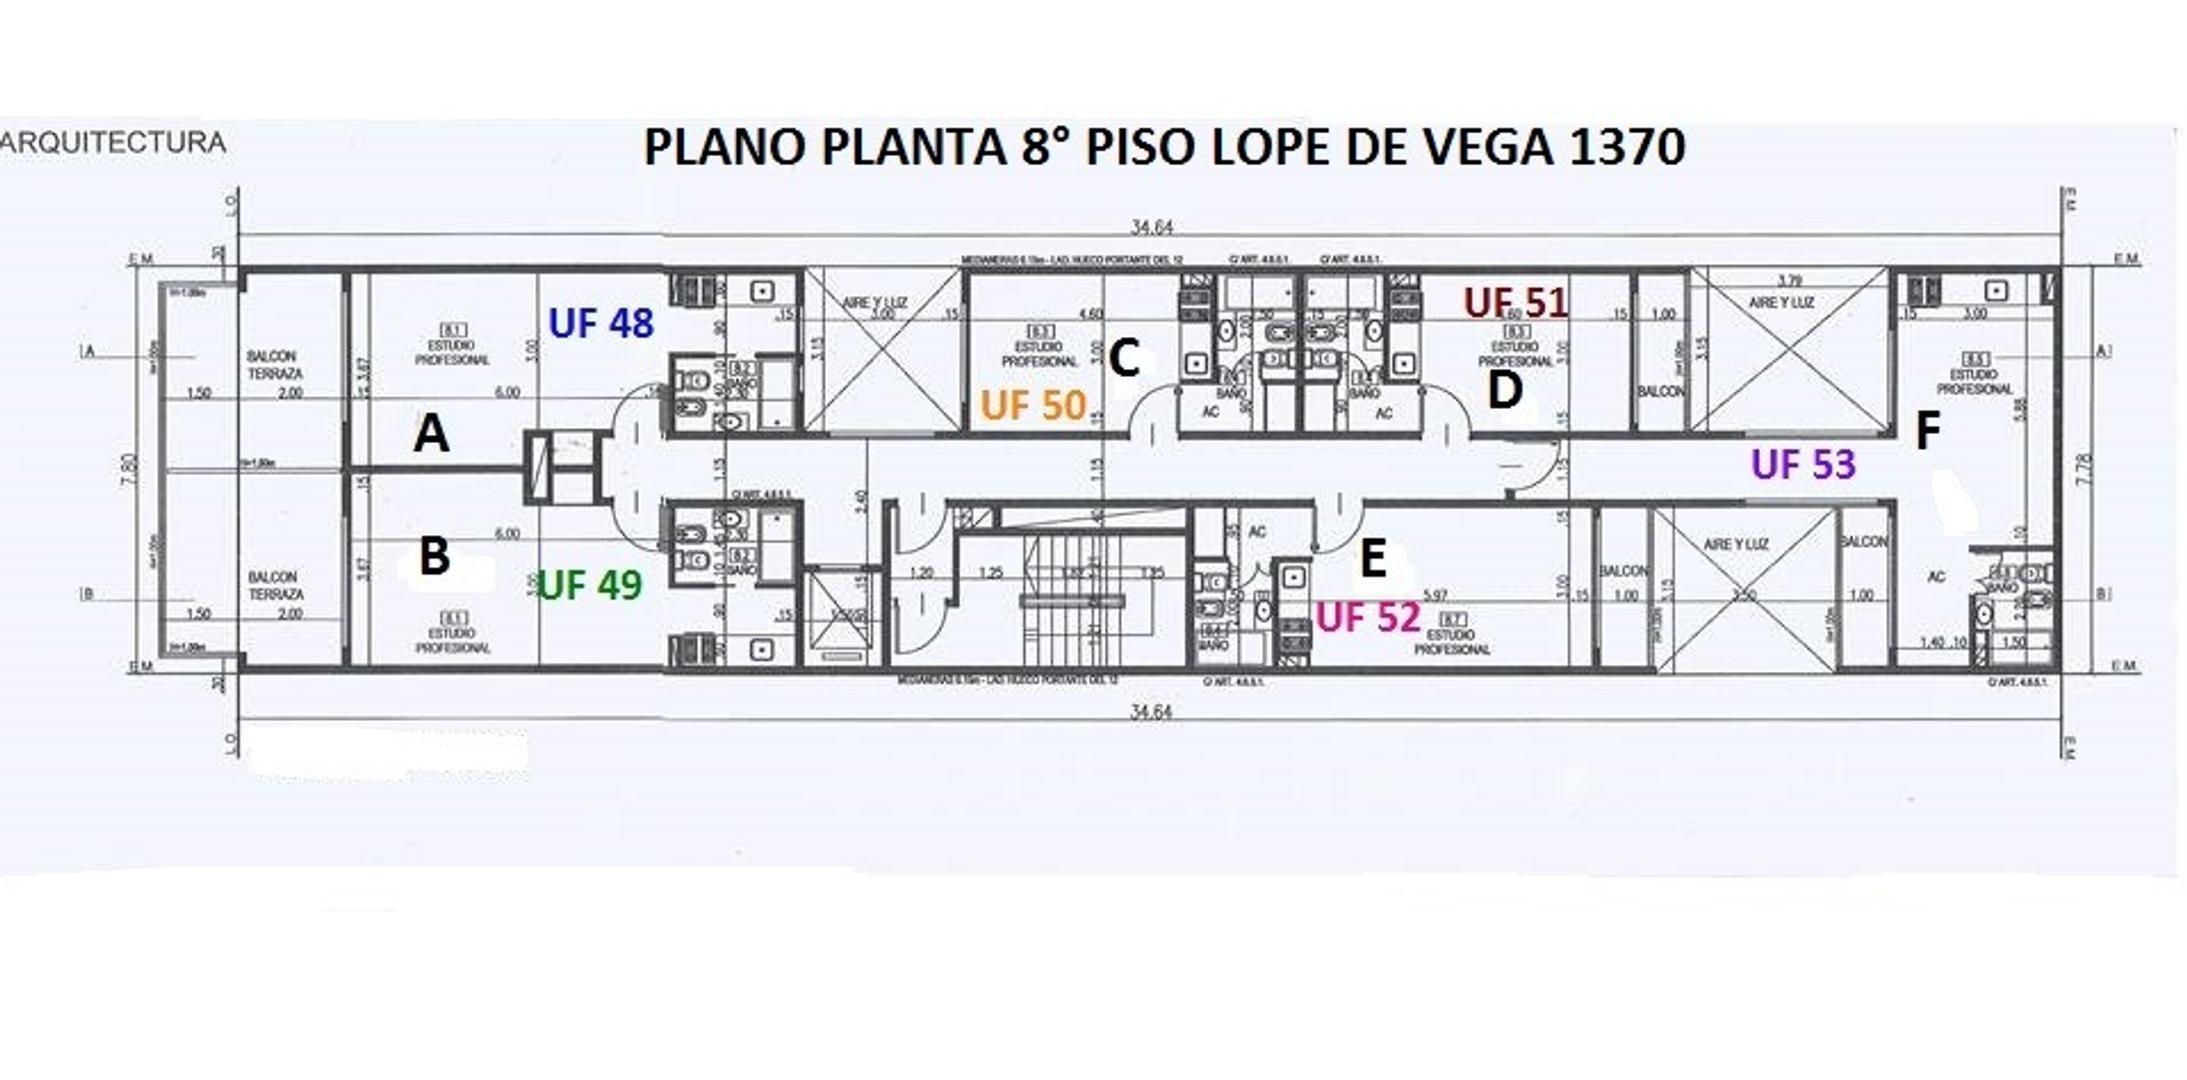 XINTEL(NIR-NIR-1021) Departamento - Venta - Argentina, Capital Federal - AV. LOPE DE VEGA  AL 1300